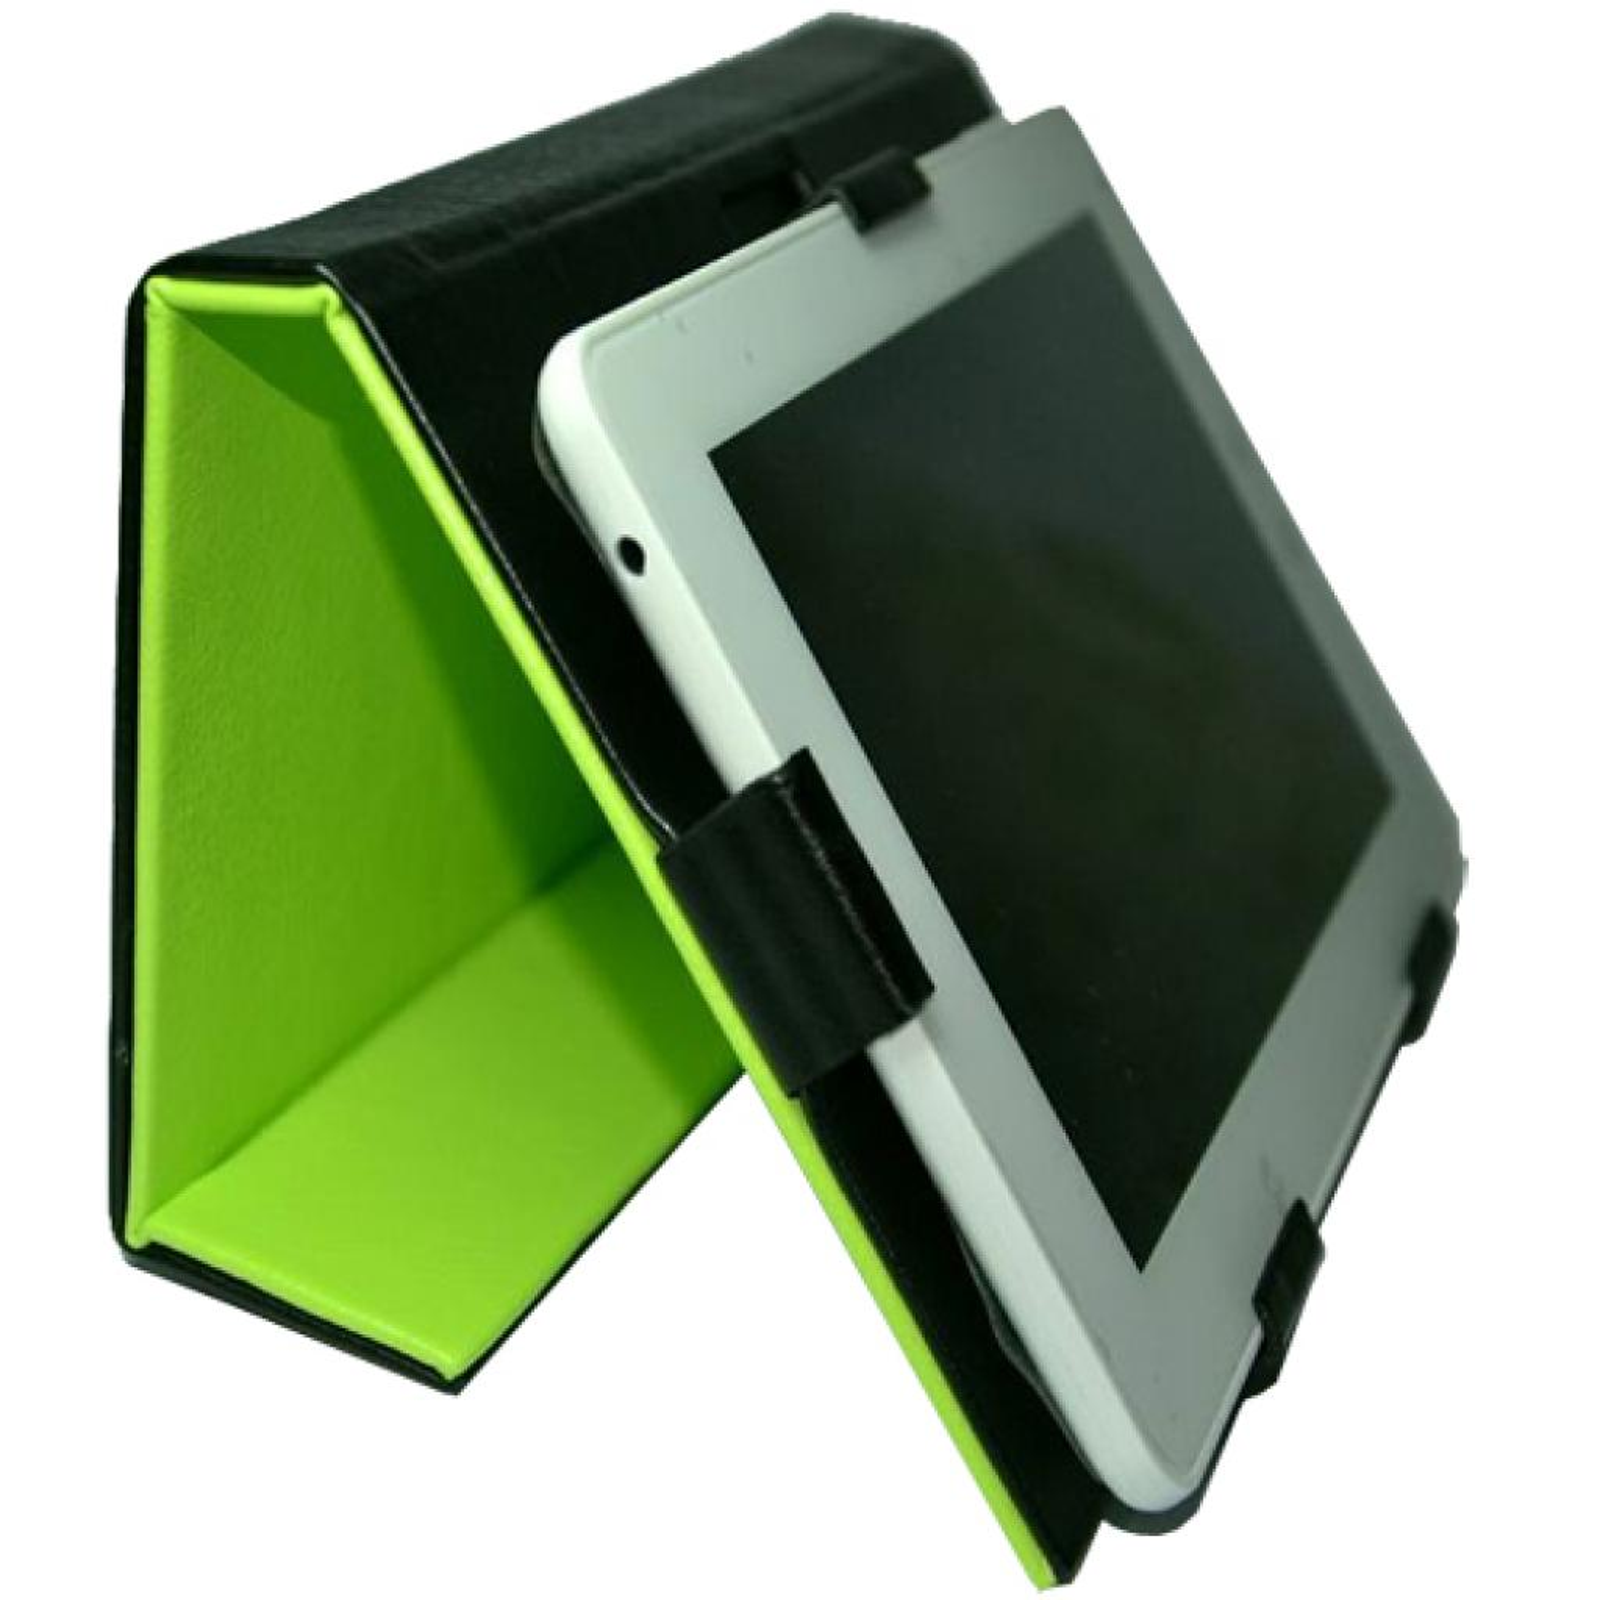 Чехол для планшета Vento 9 Desire Bright - lime изображение 3